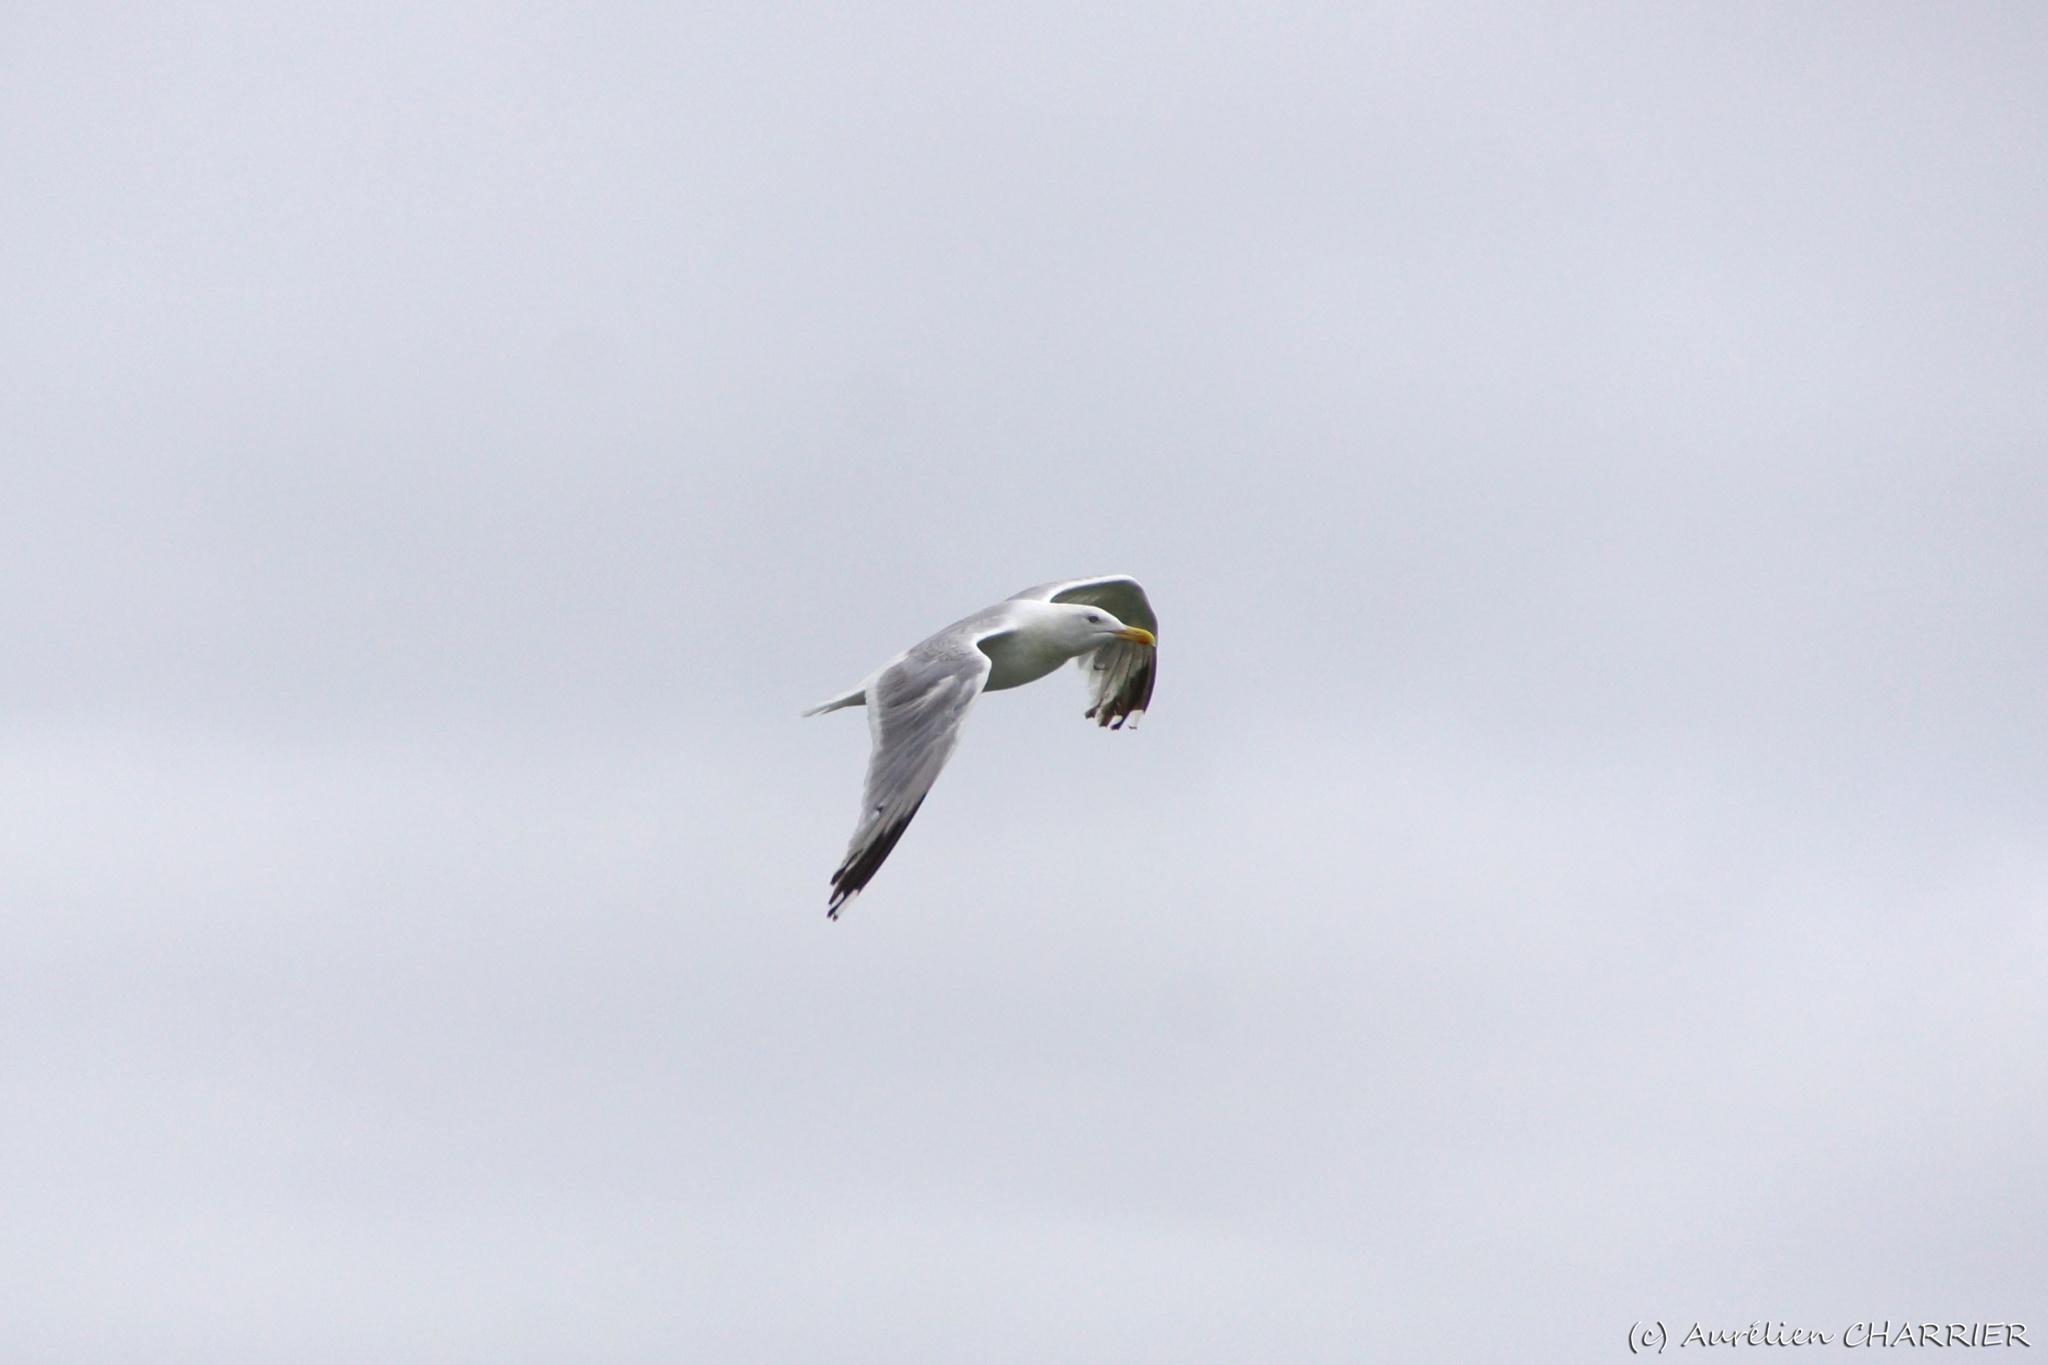 Herring gull by Aurélien CHARRIER